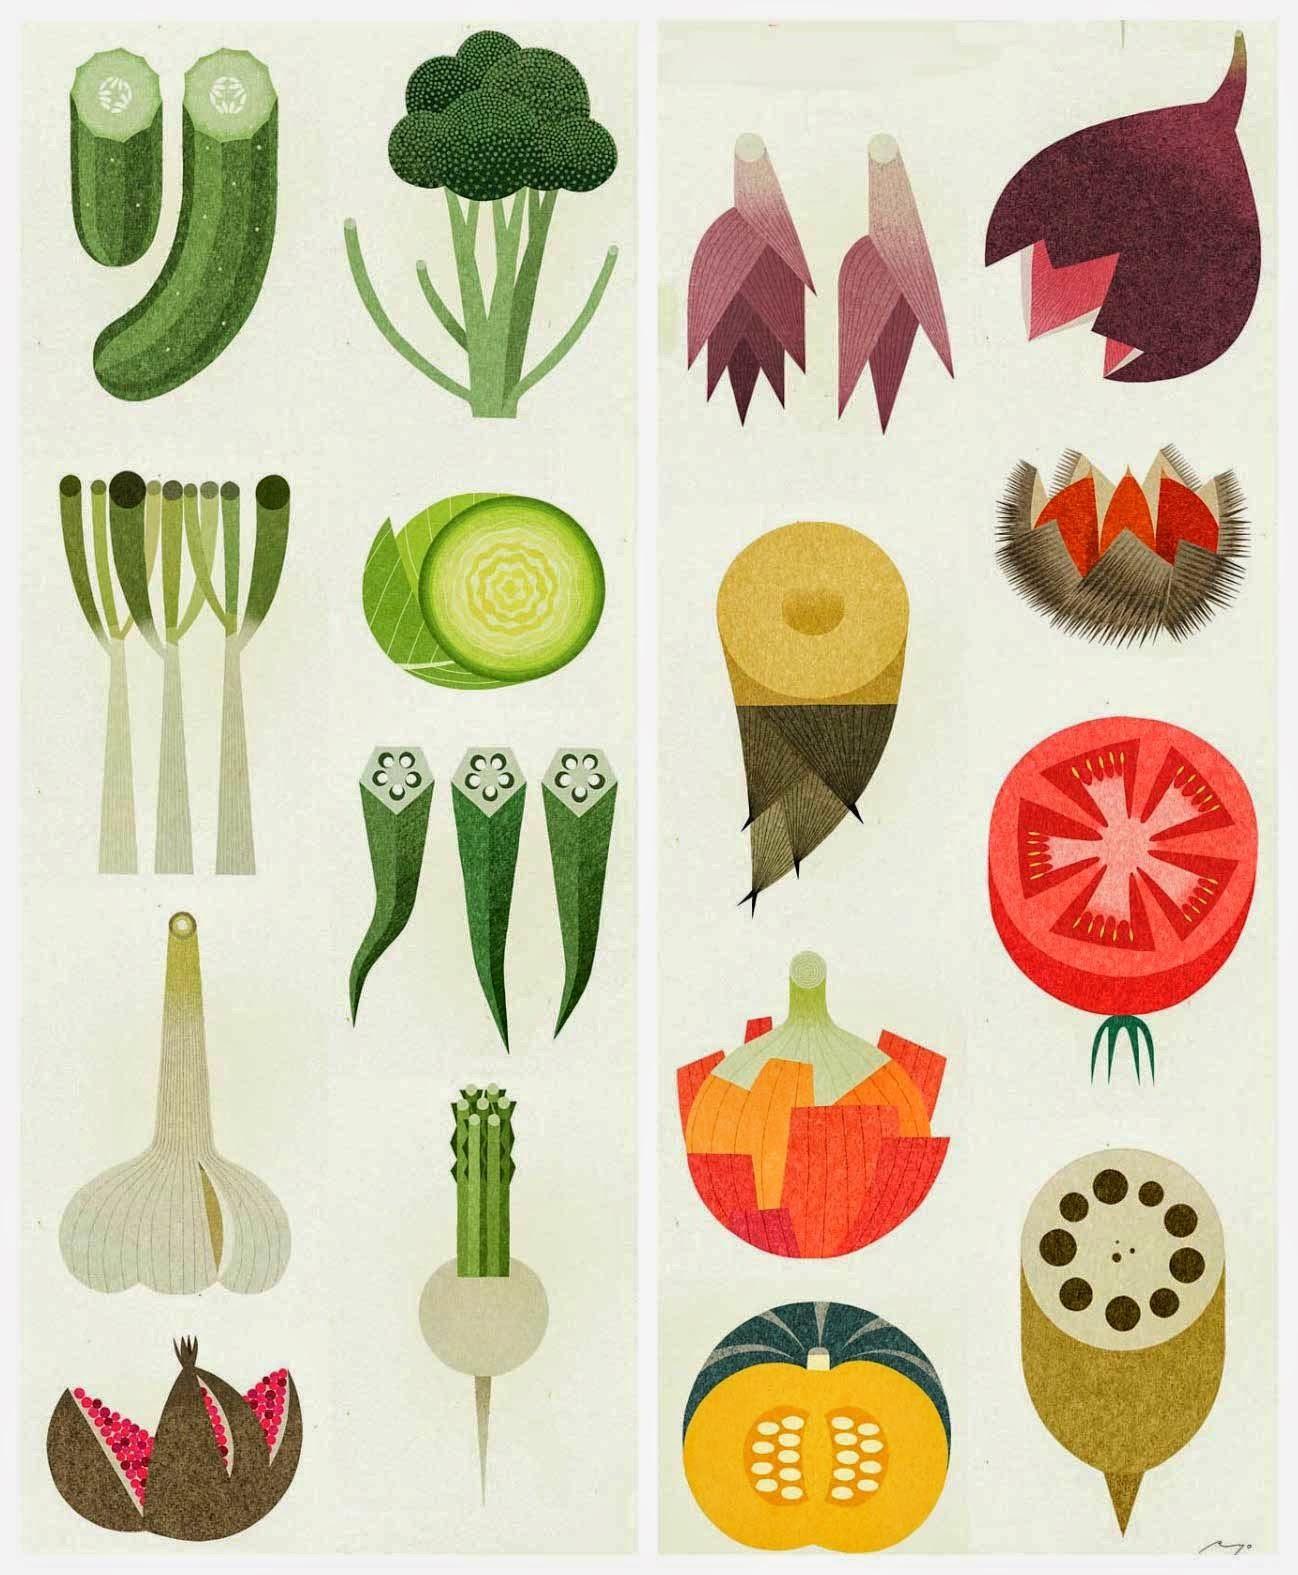 puntadas 342 | イラスト シンプル、野菜、插画